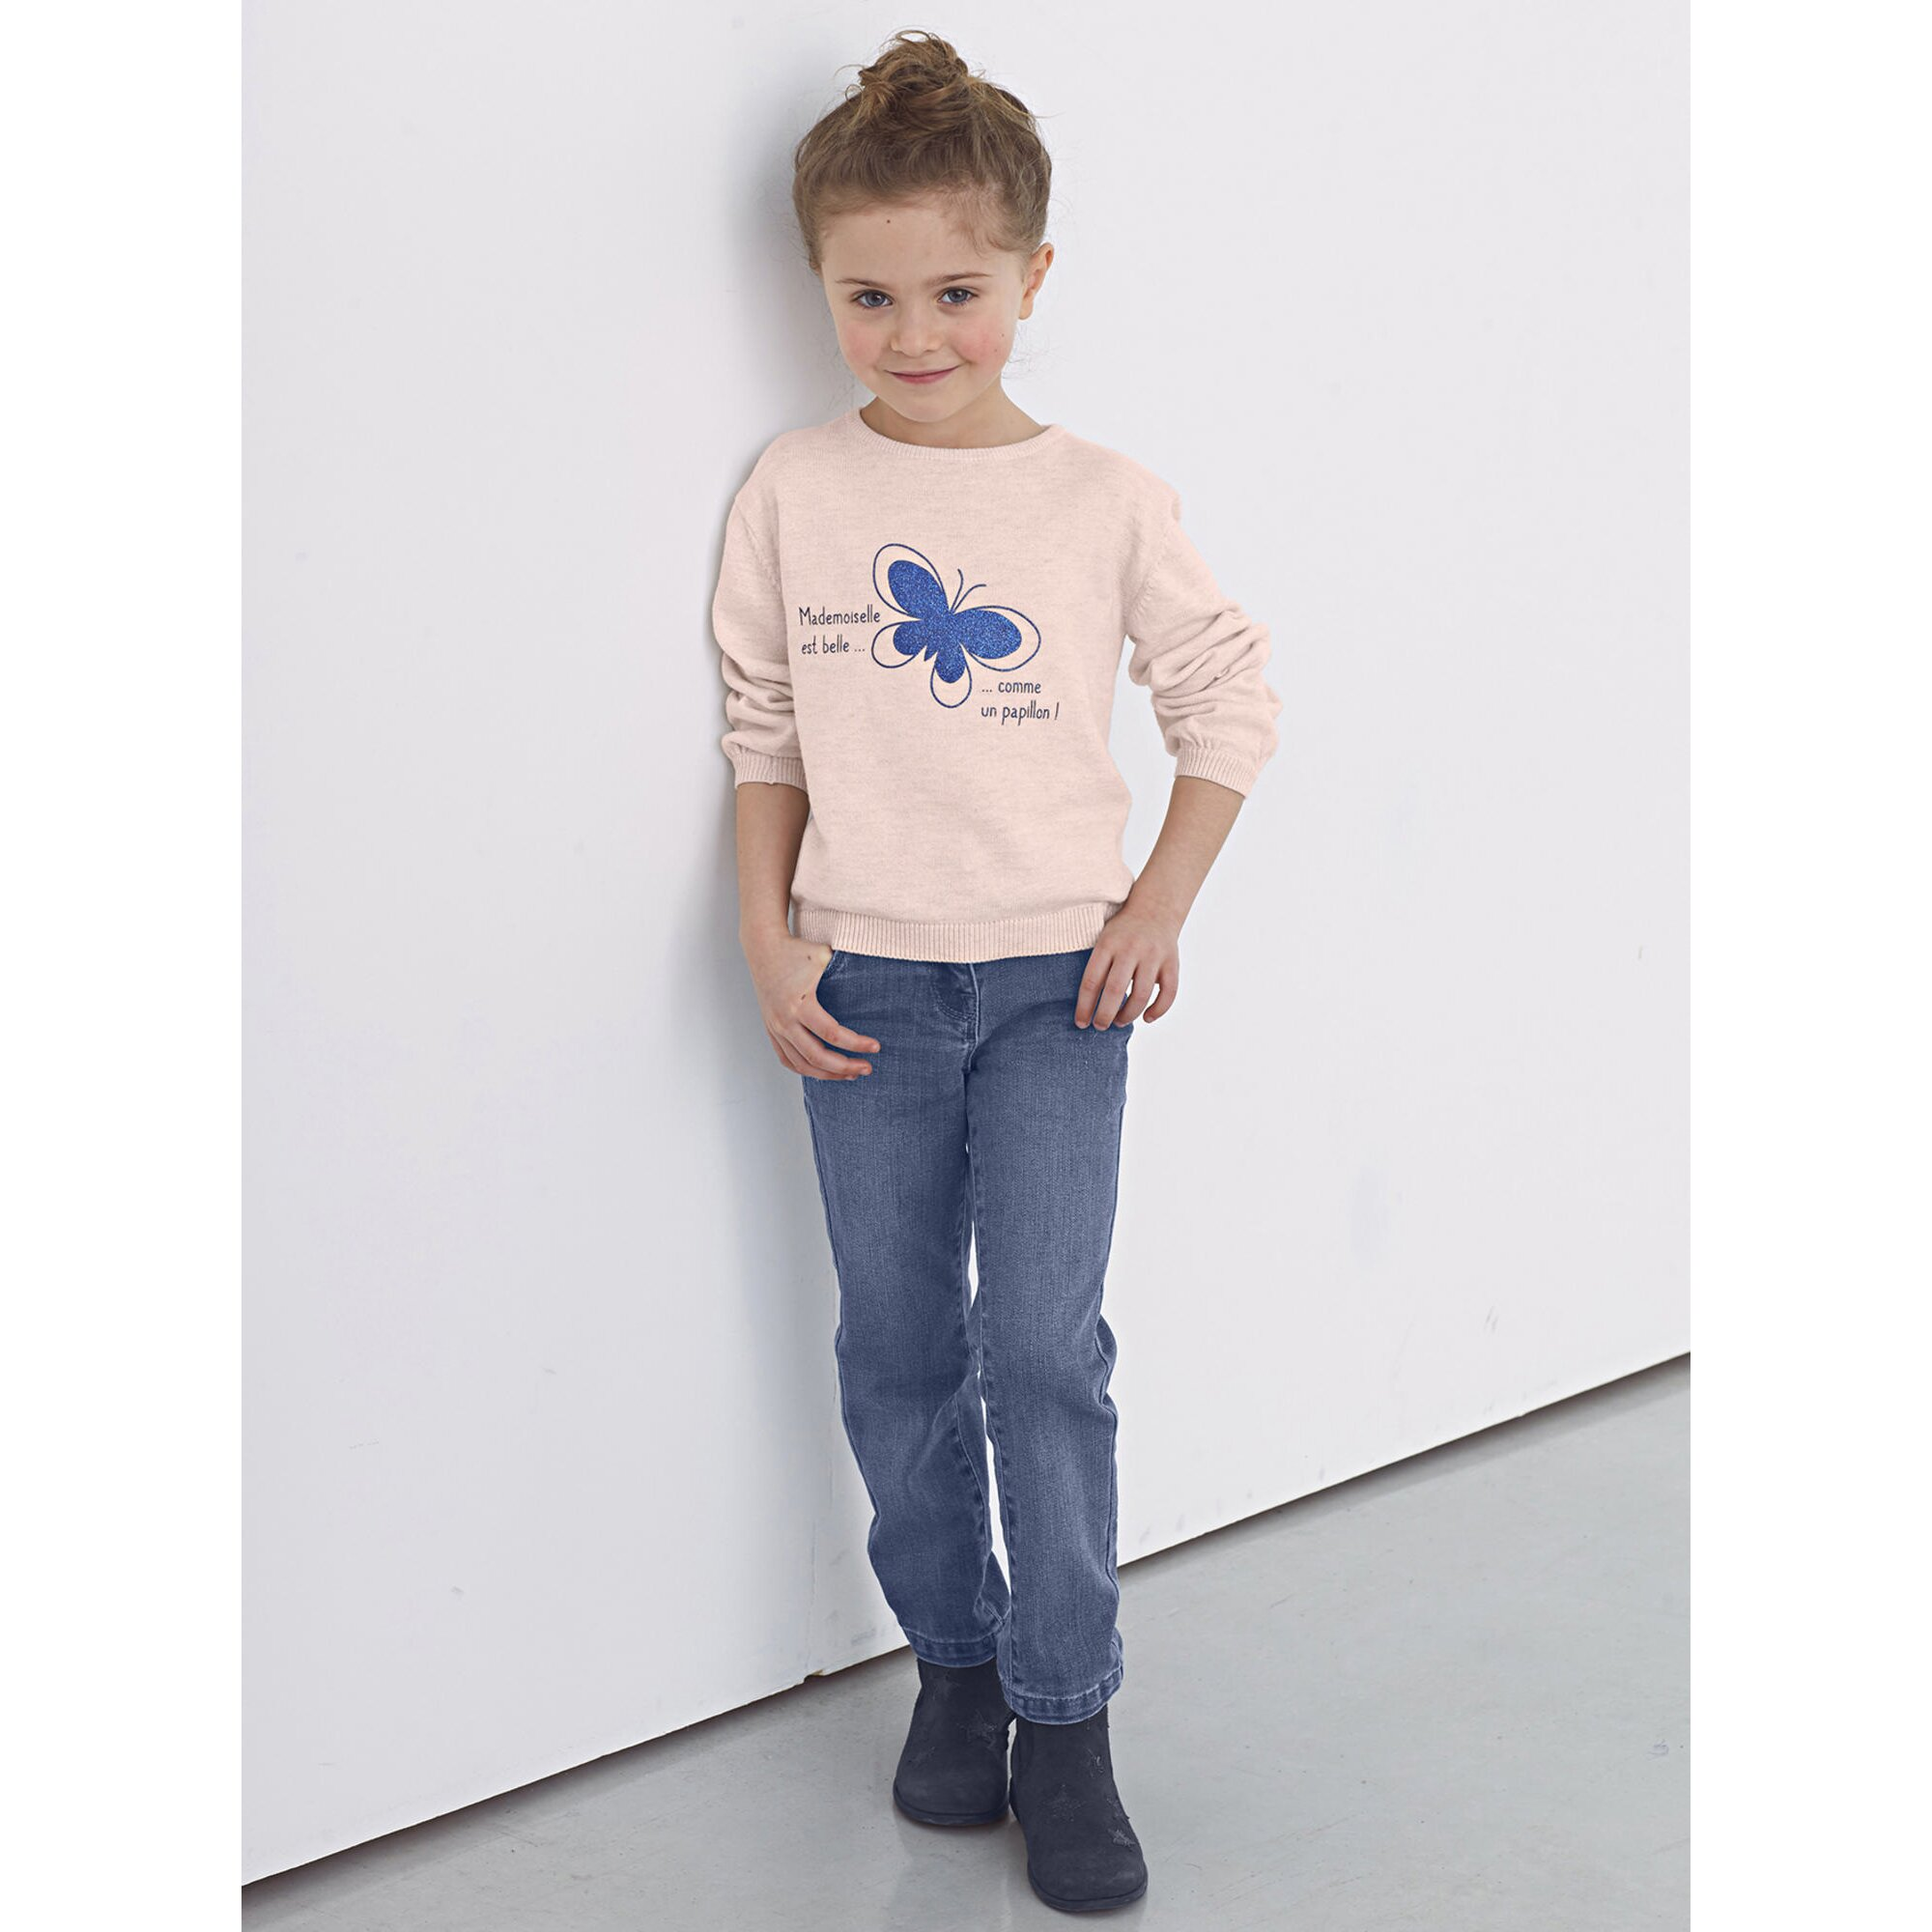 vertbaudet-stretch-jeans-fur-madchen-huftweite-comfort, 23.99 EUR @ babywalz-de